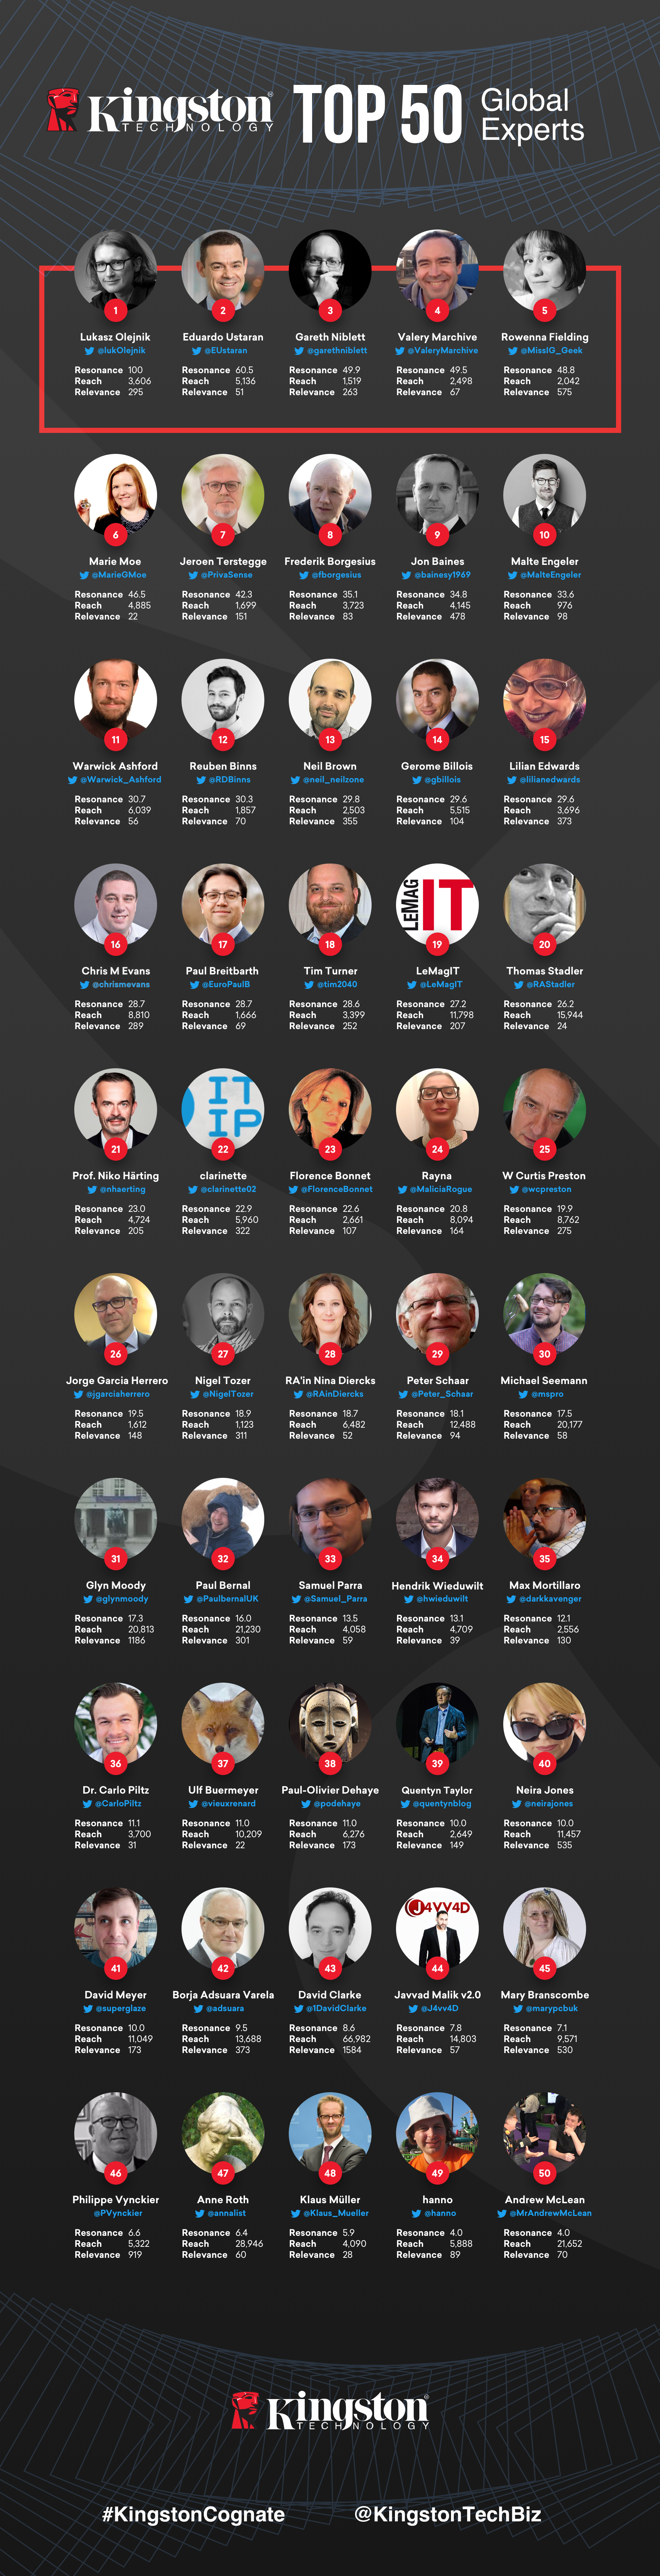 Kingston Cognate Top 50 Global Experts